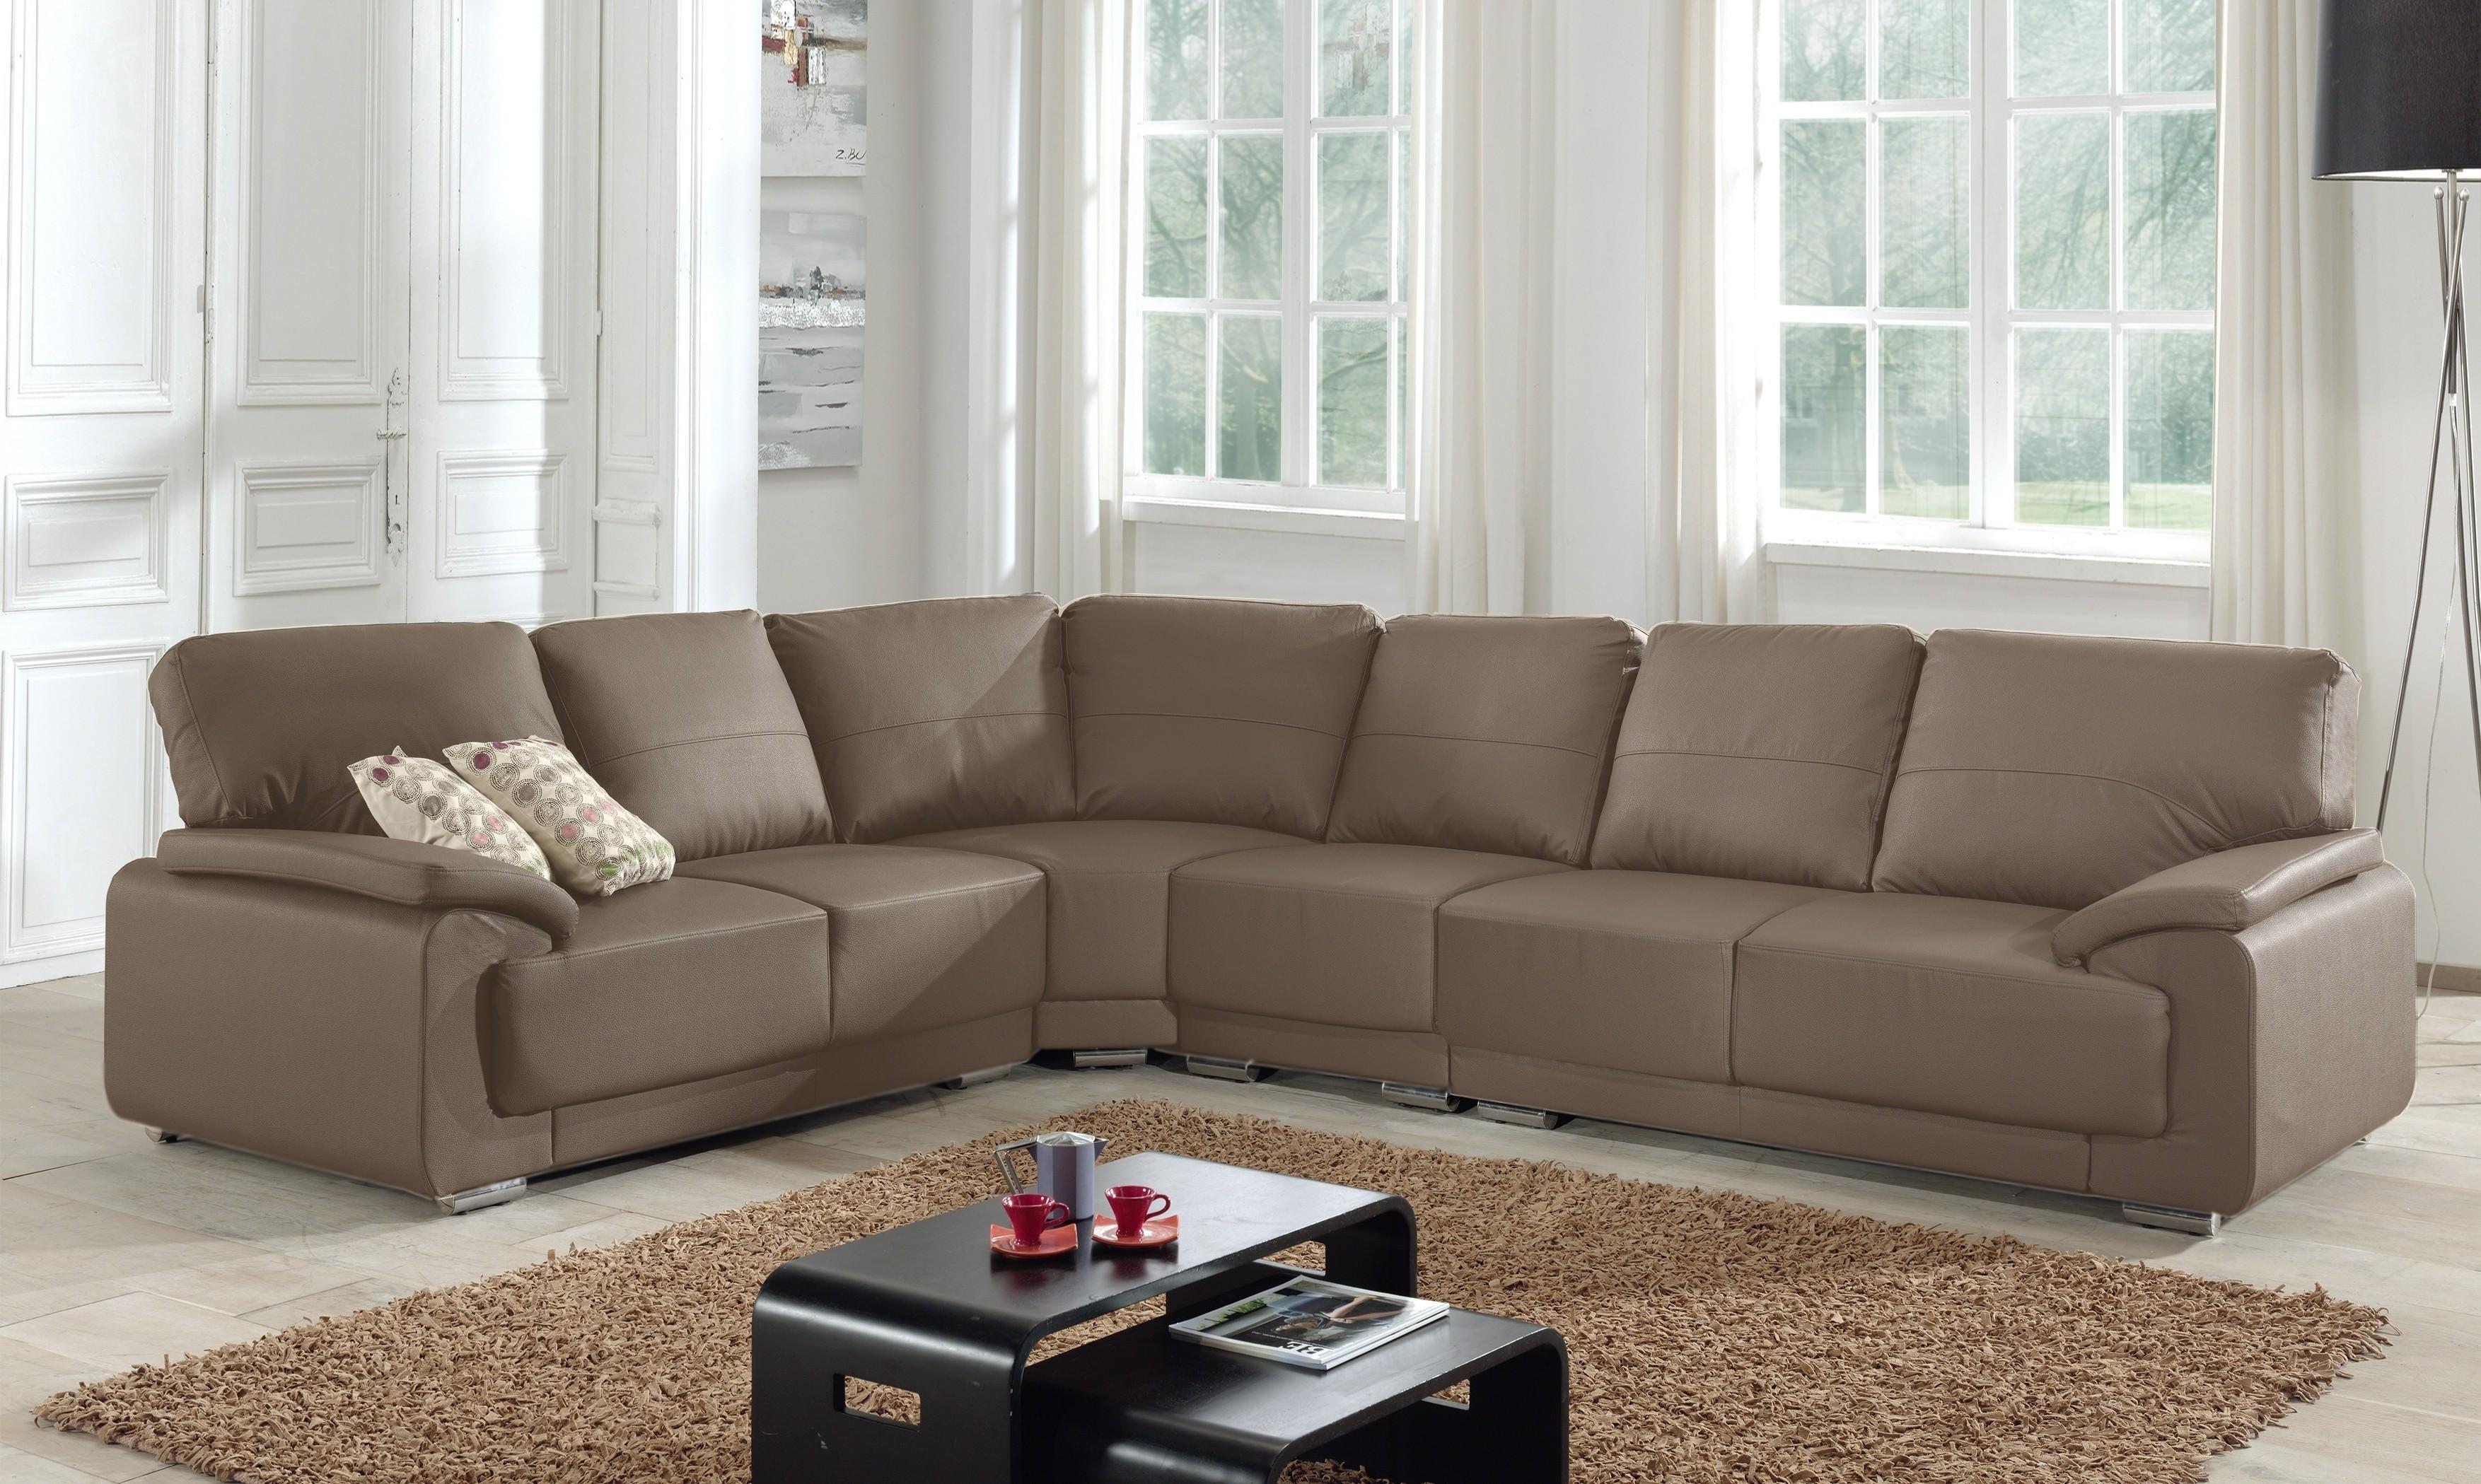 Canapé D'angle Convertible Modulable Simili Cuir